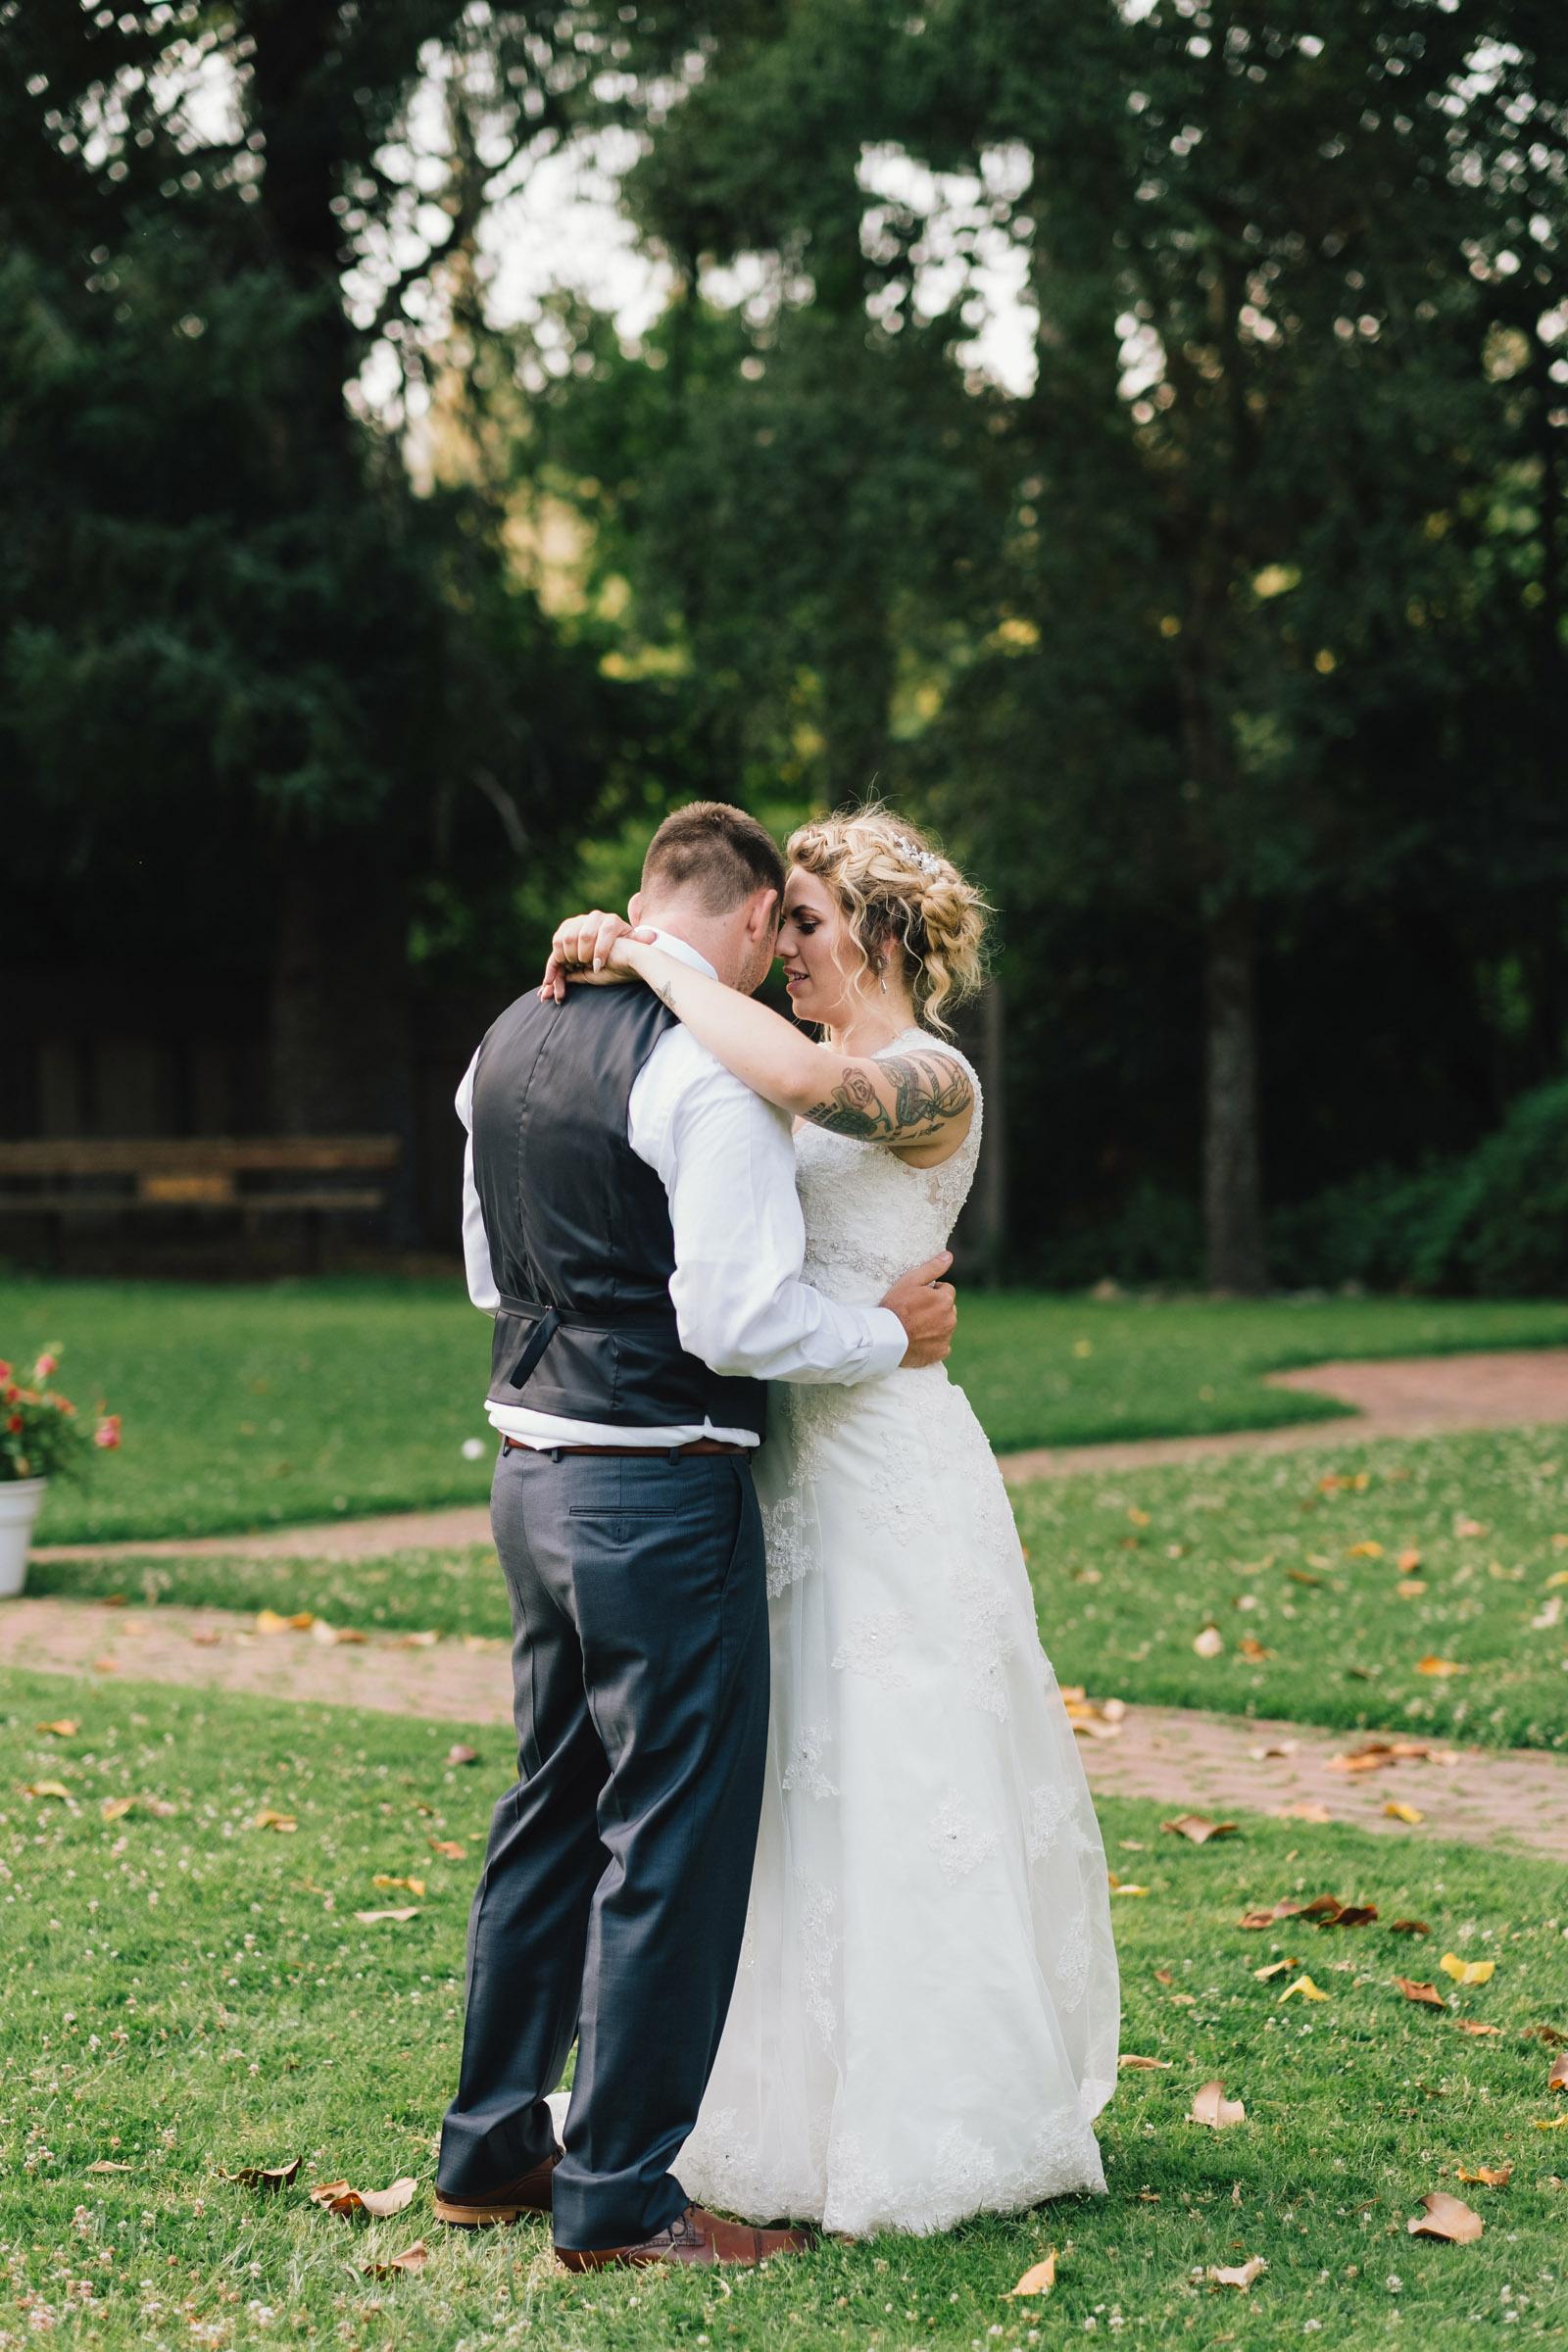 6-24-17 April and Josh Wedding-146.jpg